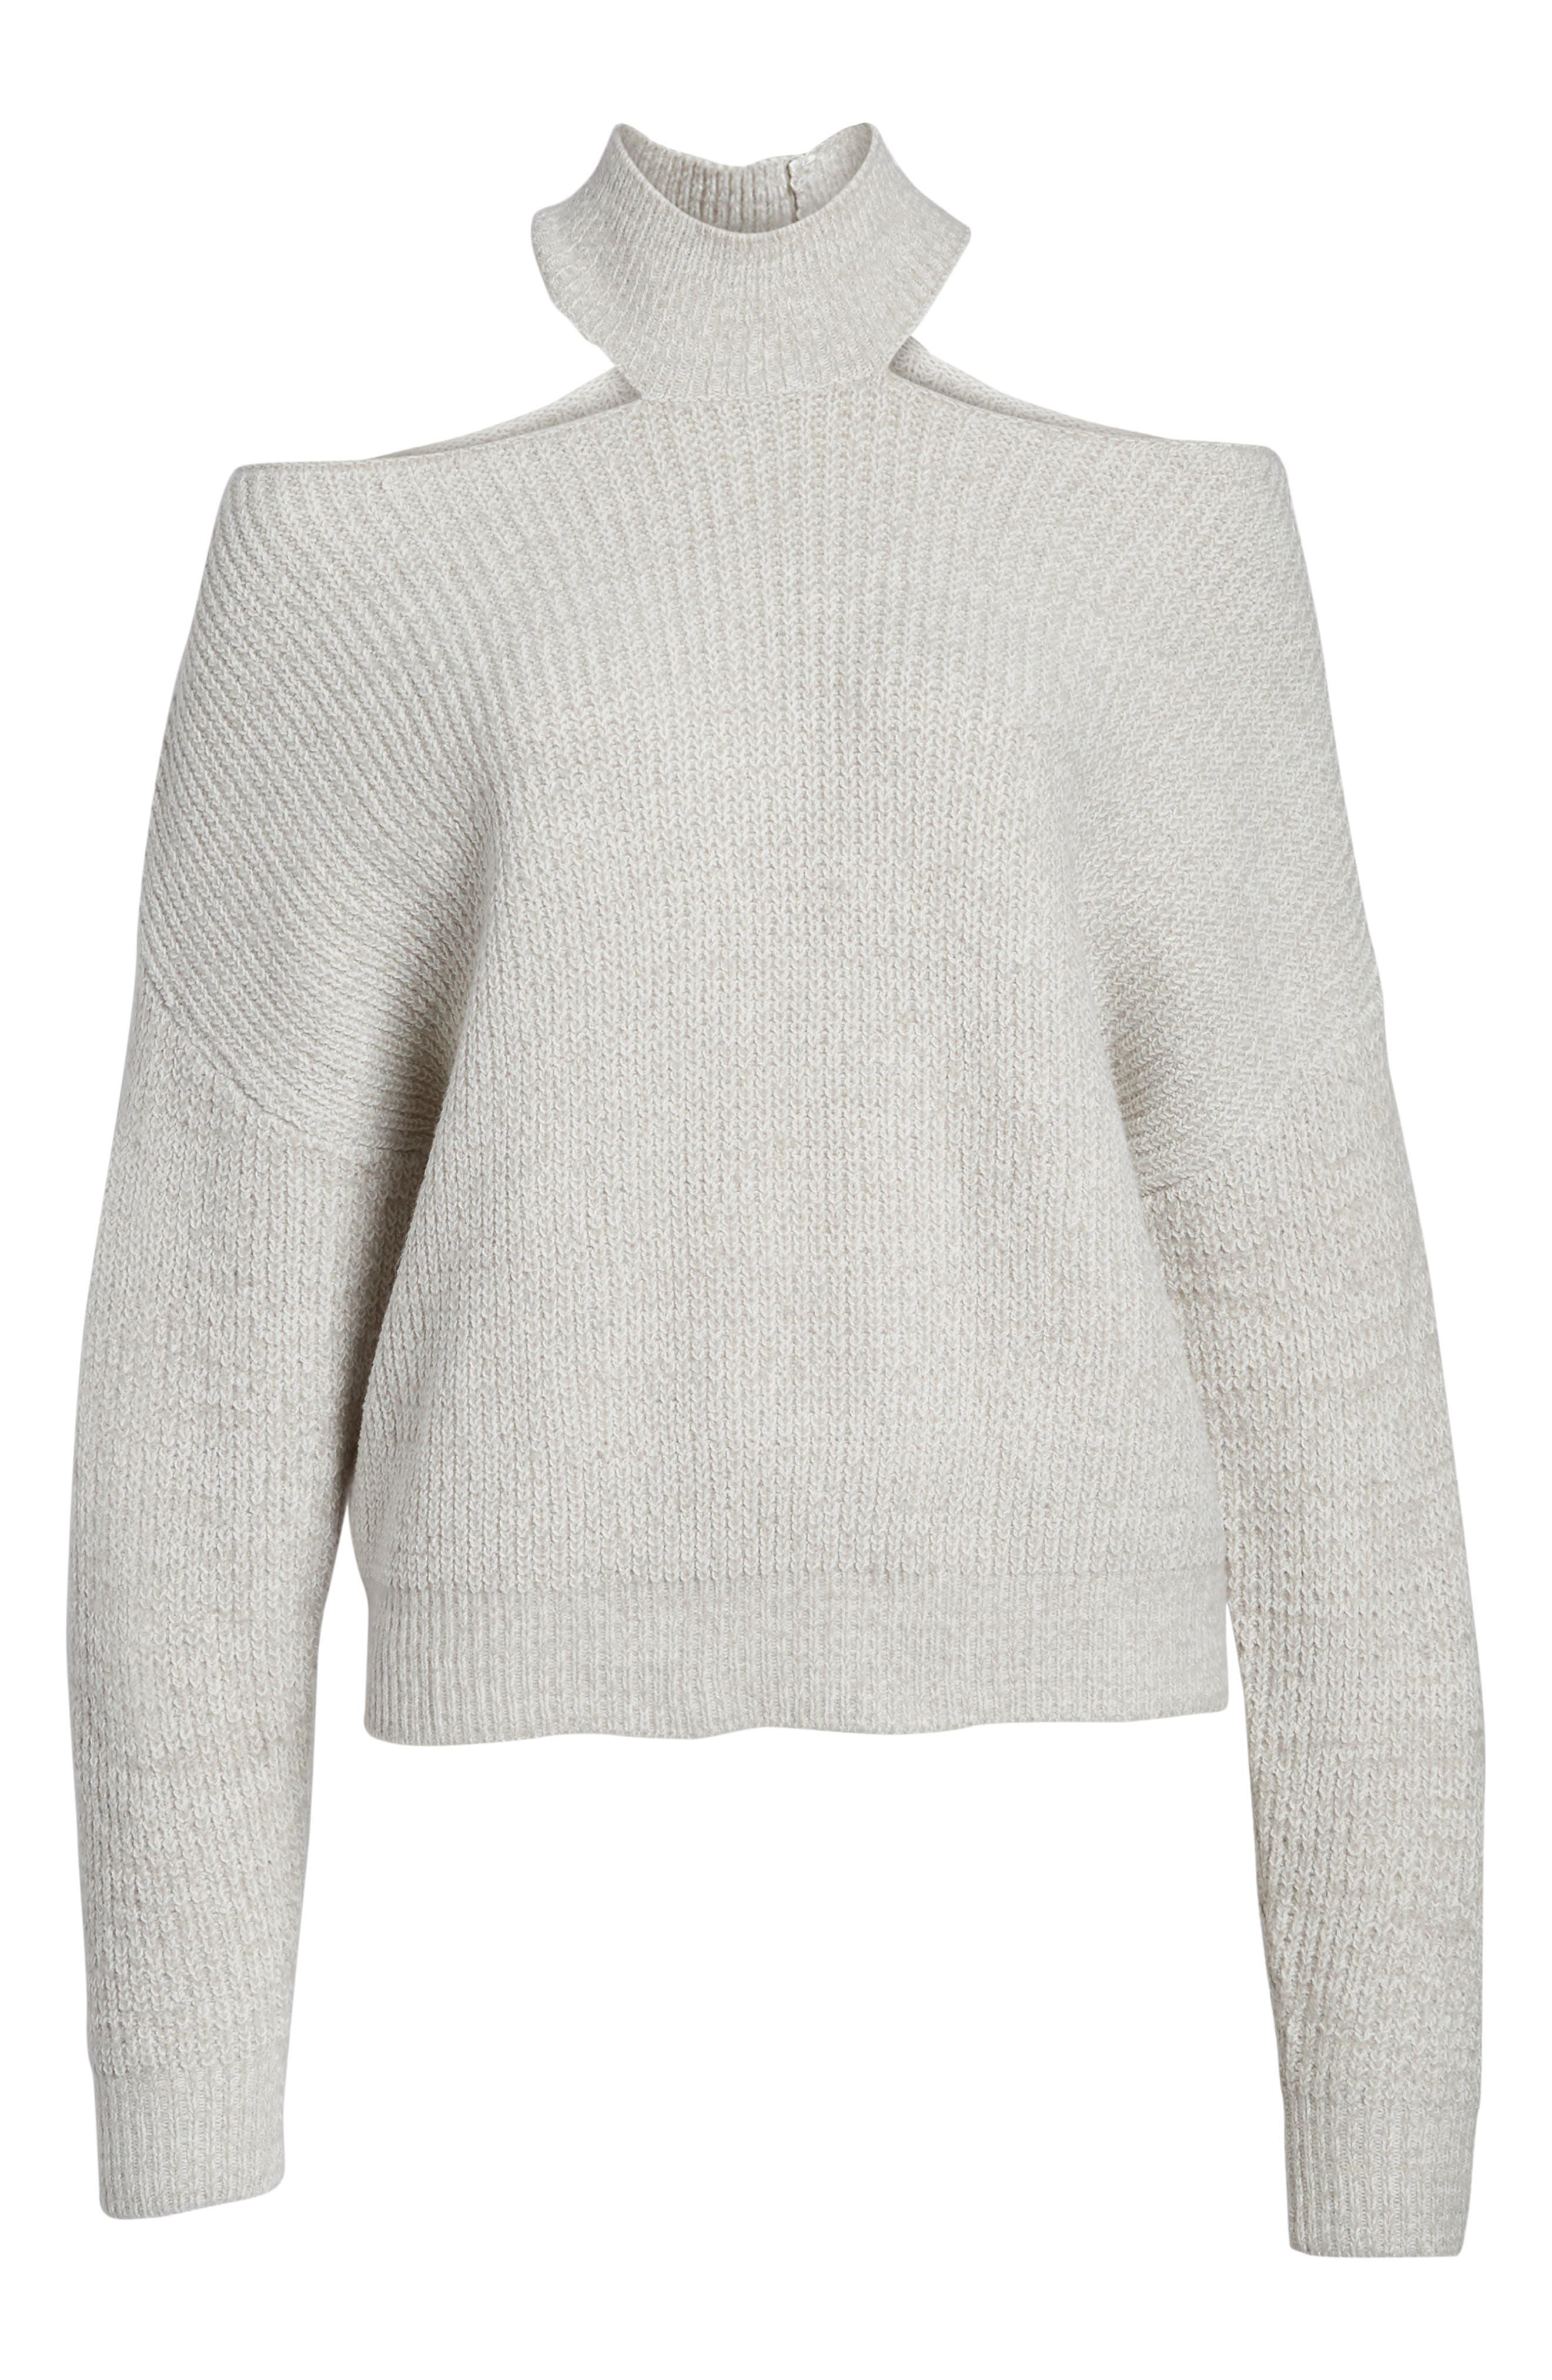 Cutout Turtleneck Sweater,                             Alternate thumbnail 12, color,